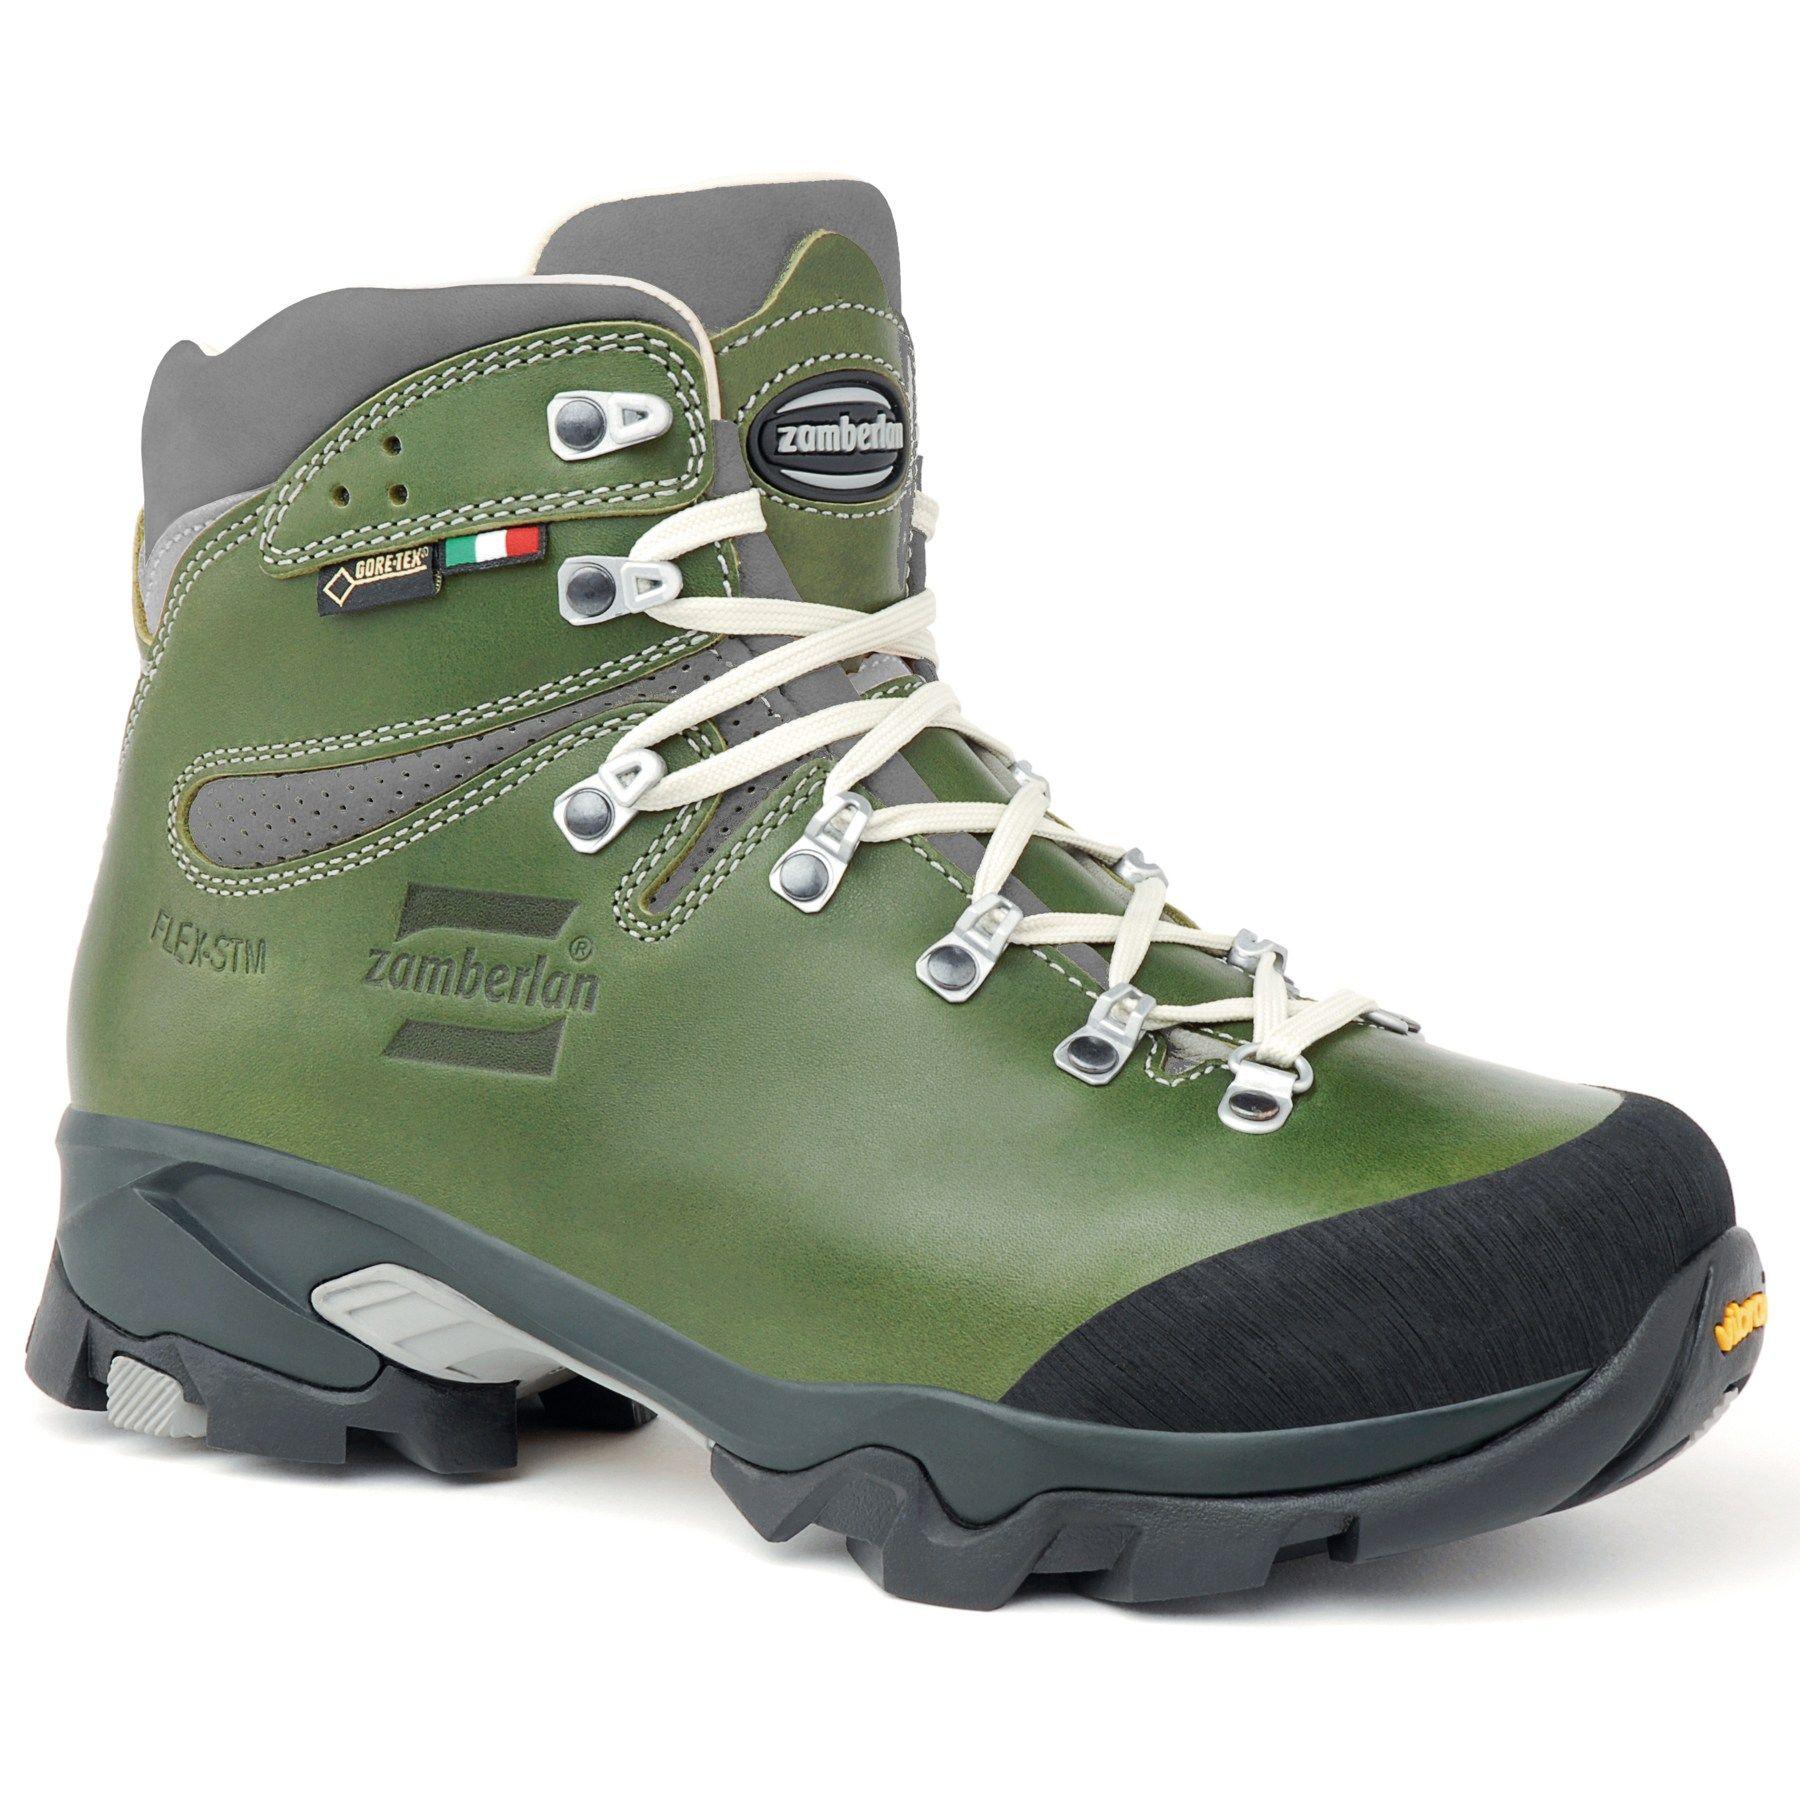 3bdf52802c8 Zamberlan Women's Vioz Lux GTX RR Hiking Boots Waxed Green 11 ...